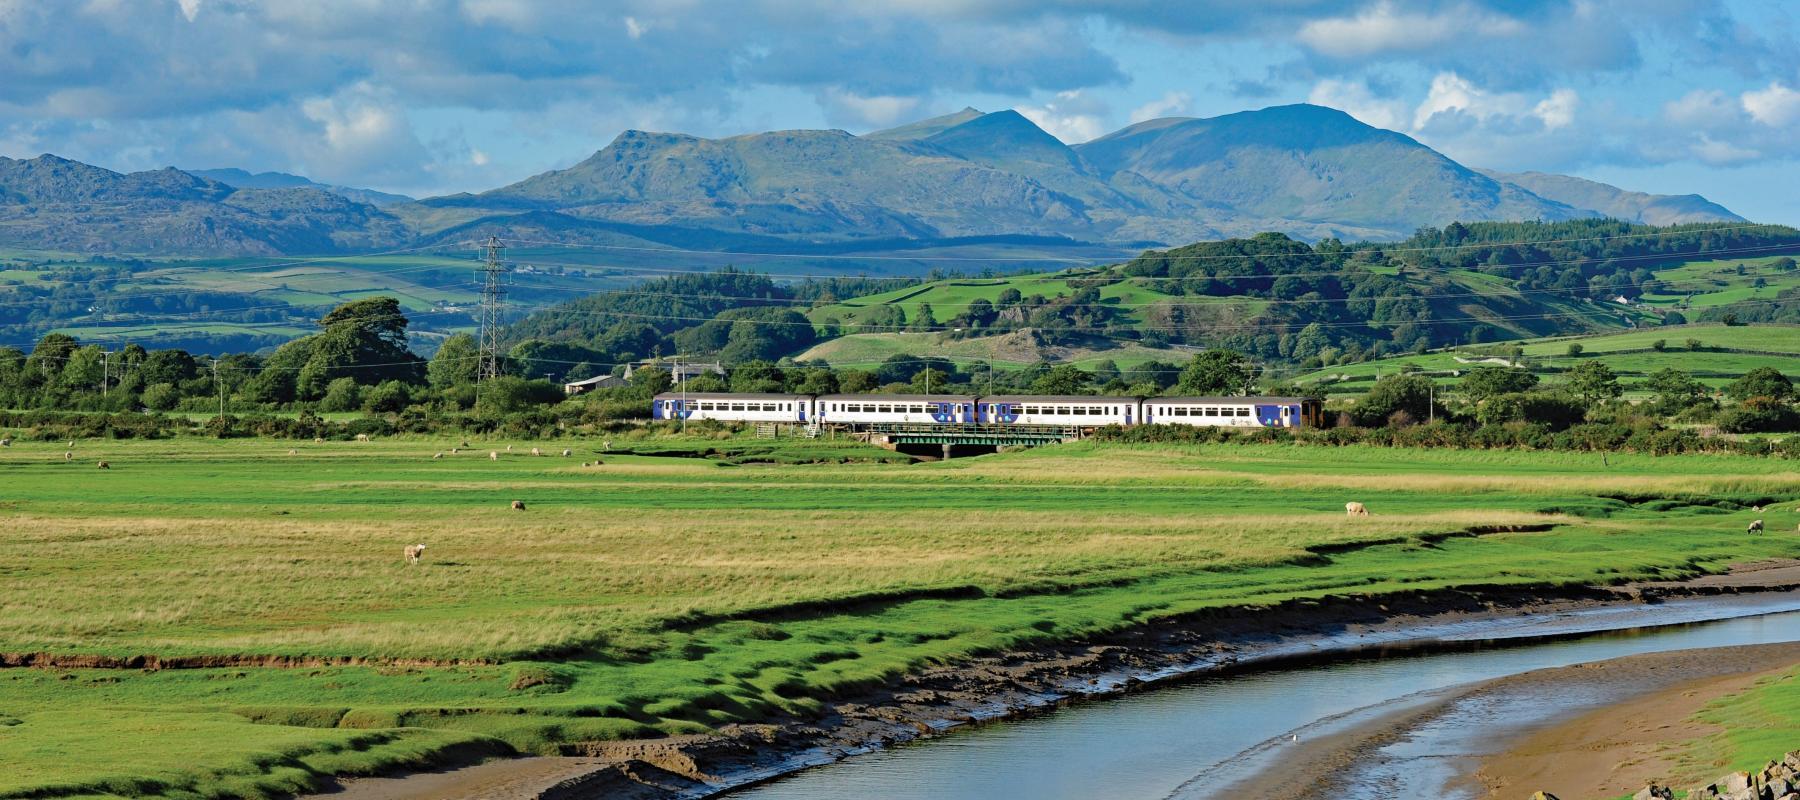 Cumbrian Coast Line. Photo: Community Rail Cumbria